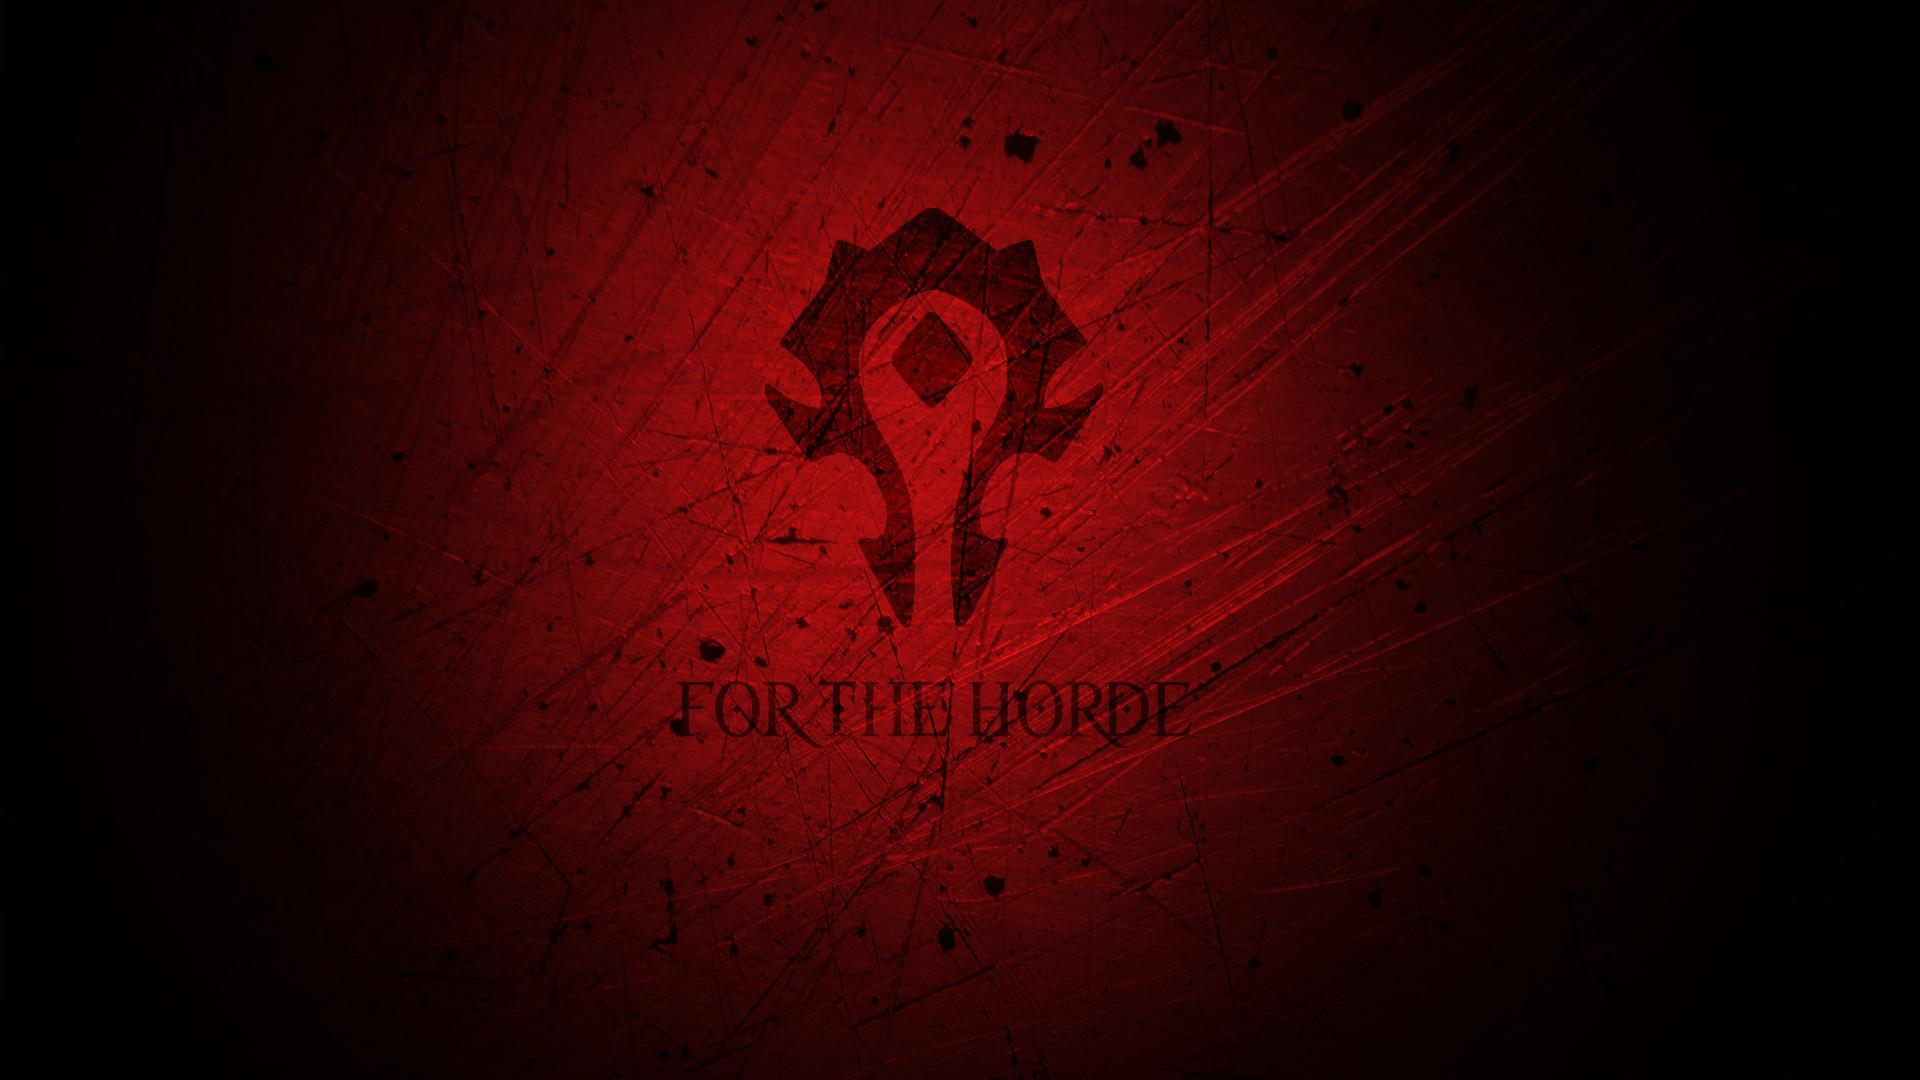 Free Download Horde Logo Wallpapers 1920x1080 For Your Desktop